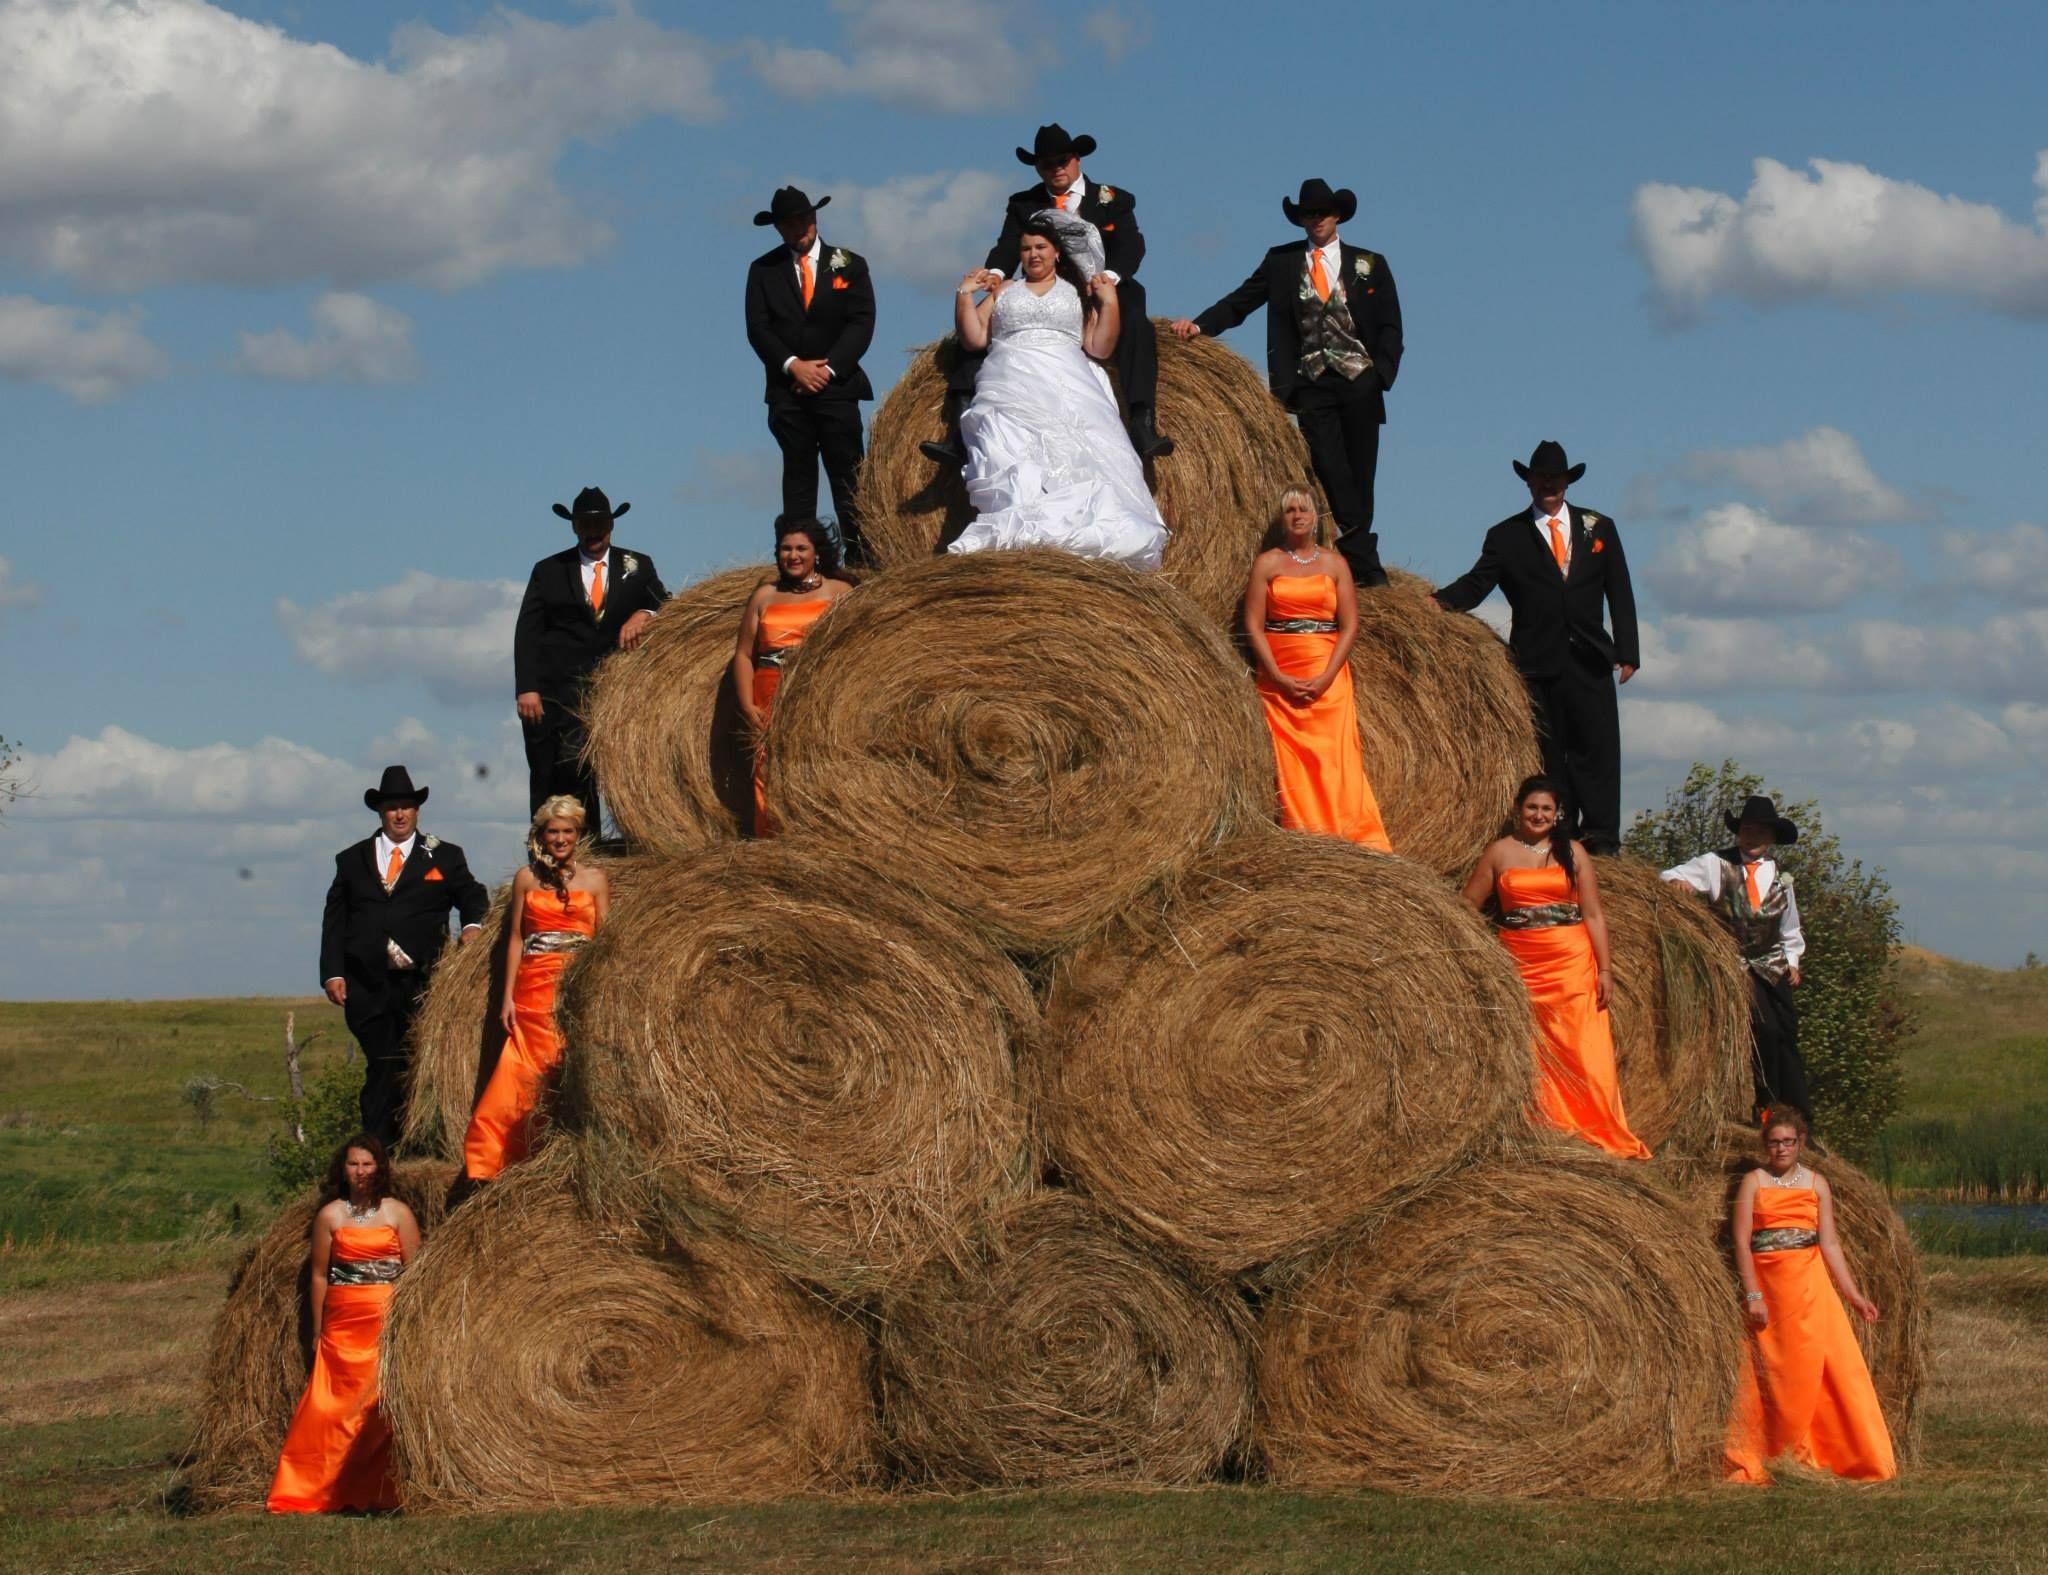 Realtree wedding dresses  Country Orange u Realtree Wedding  Wedding  Pinterest